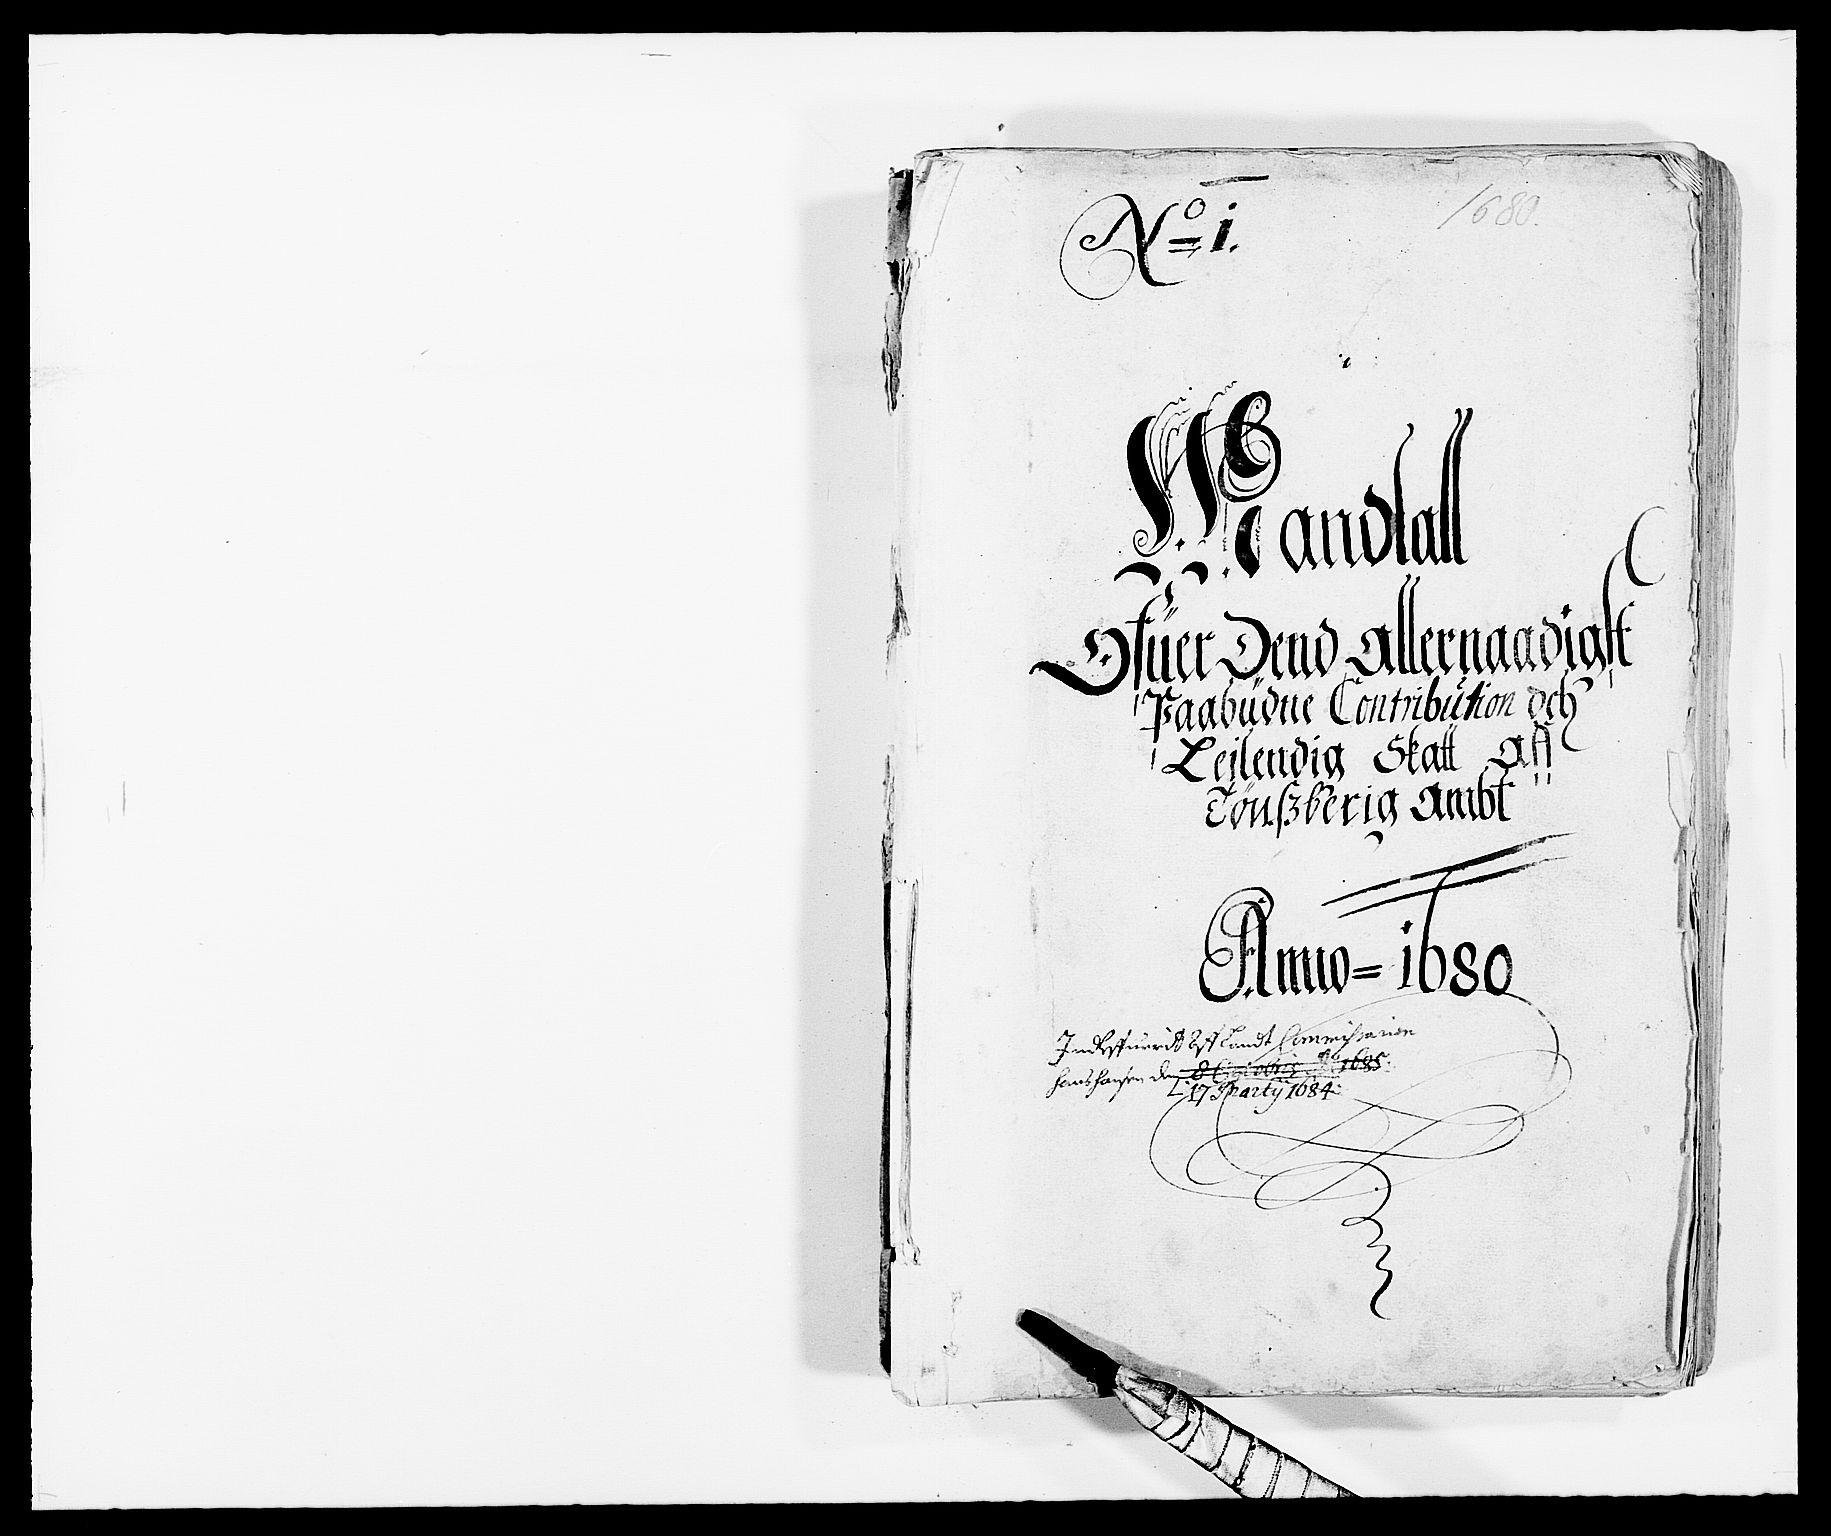 RA, Rentekammeret inntil 1814, Reviderte regnskaper, Fogderegnskap, R32/L1848: Fogderegnskap Jarlsberg grevskap, 1679-1680, s. 1